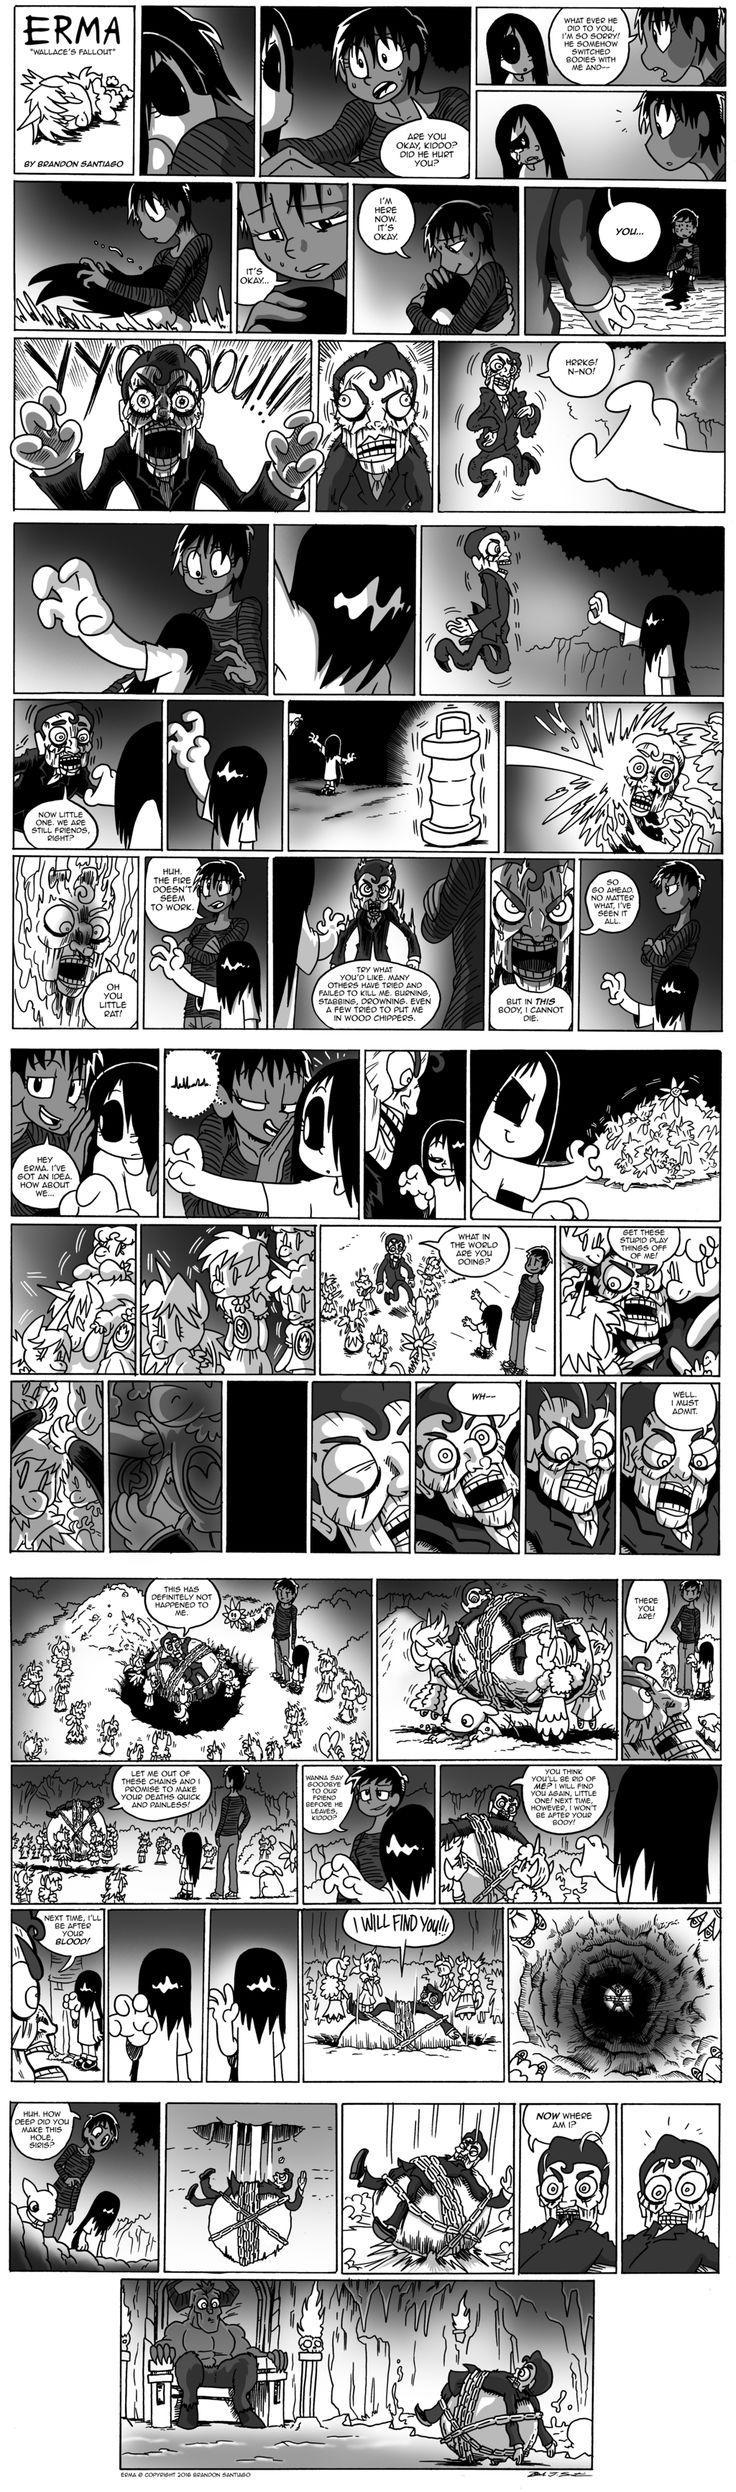 Erma- Wallace's Fallout by BJSinc on DeviantArt